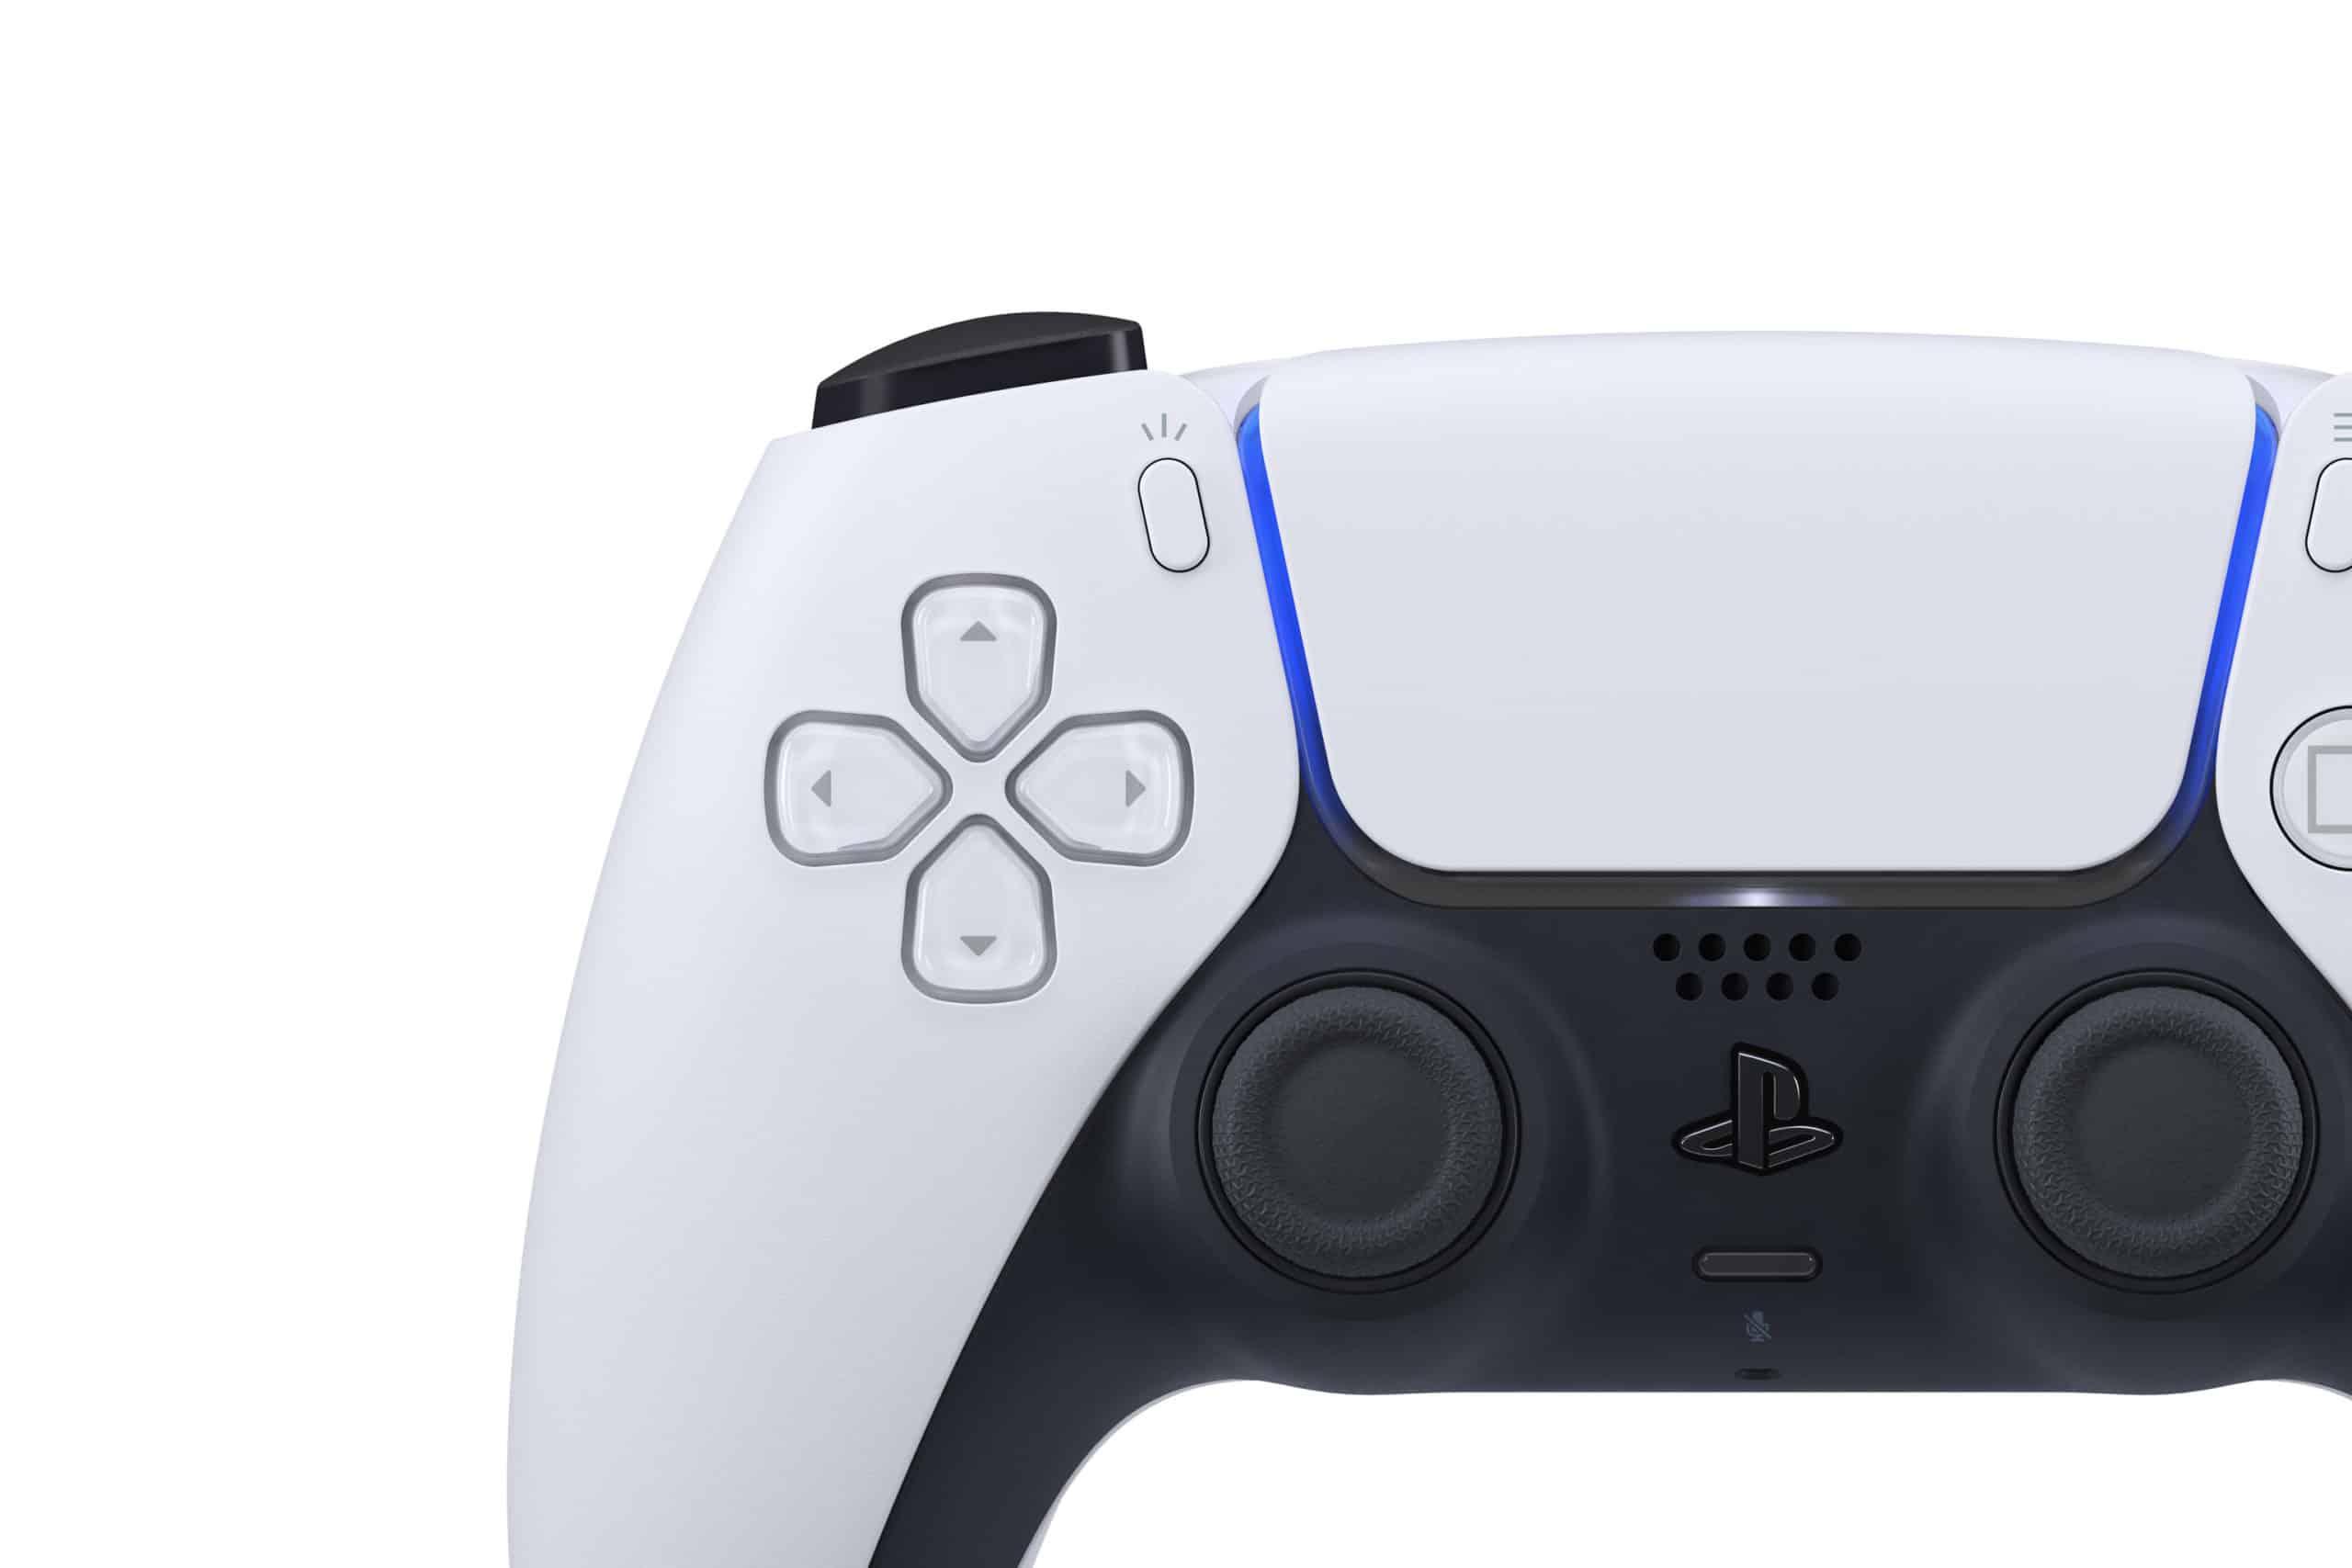 Black PS5 PlayStation 5 Activities Release Date DualSense Controller Next-Gen EA Games